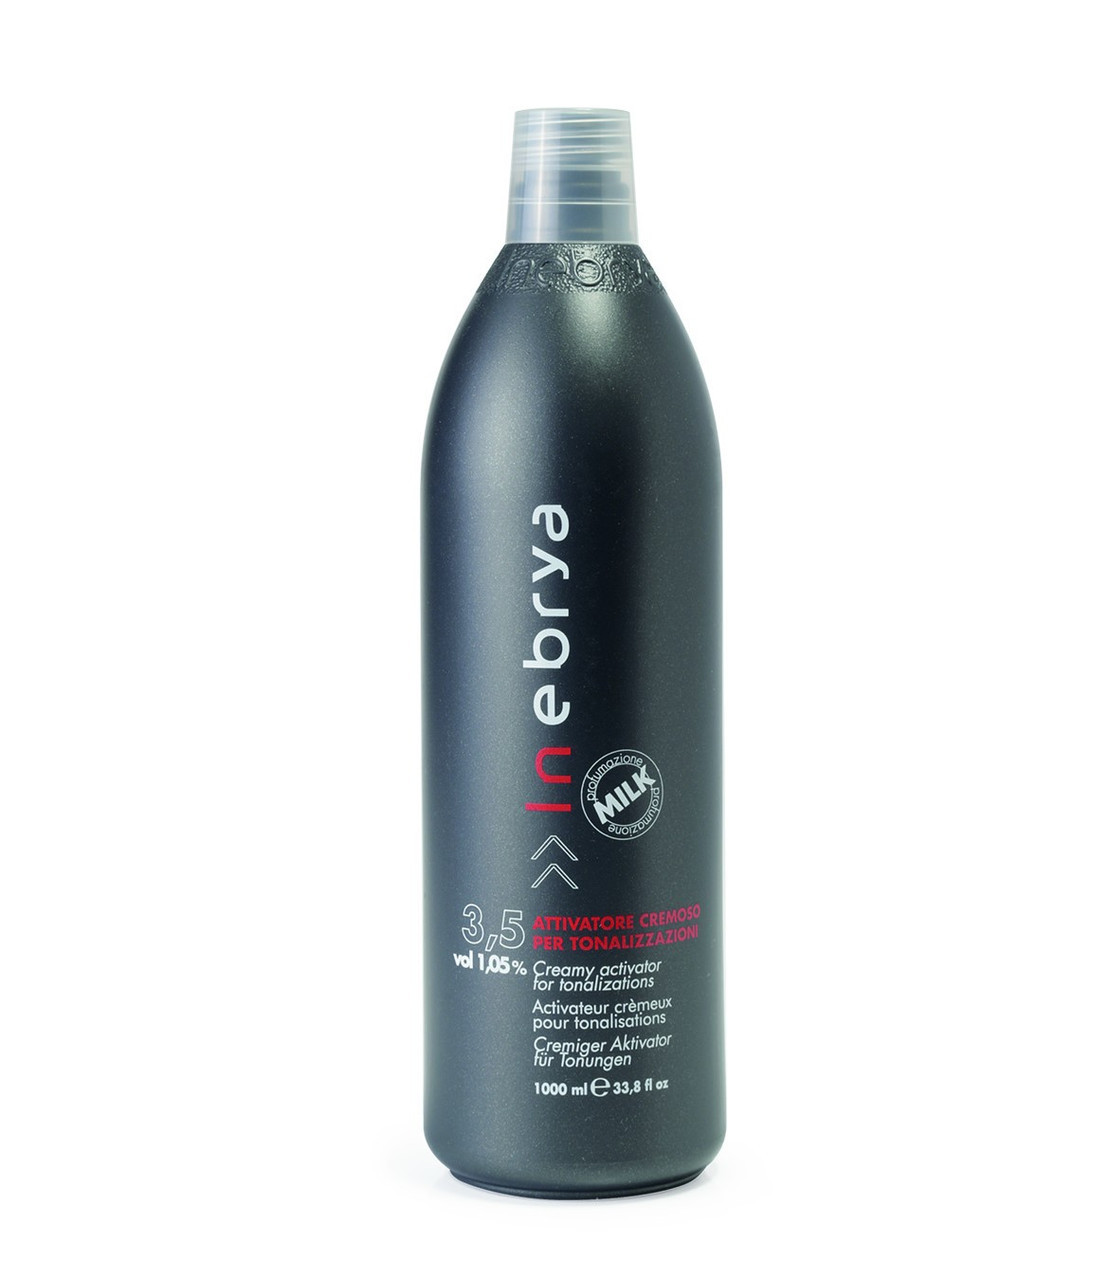 Крем активатор для тонирования волос 3,5 Vol, 1,05%, Inebrya, 1000ml